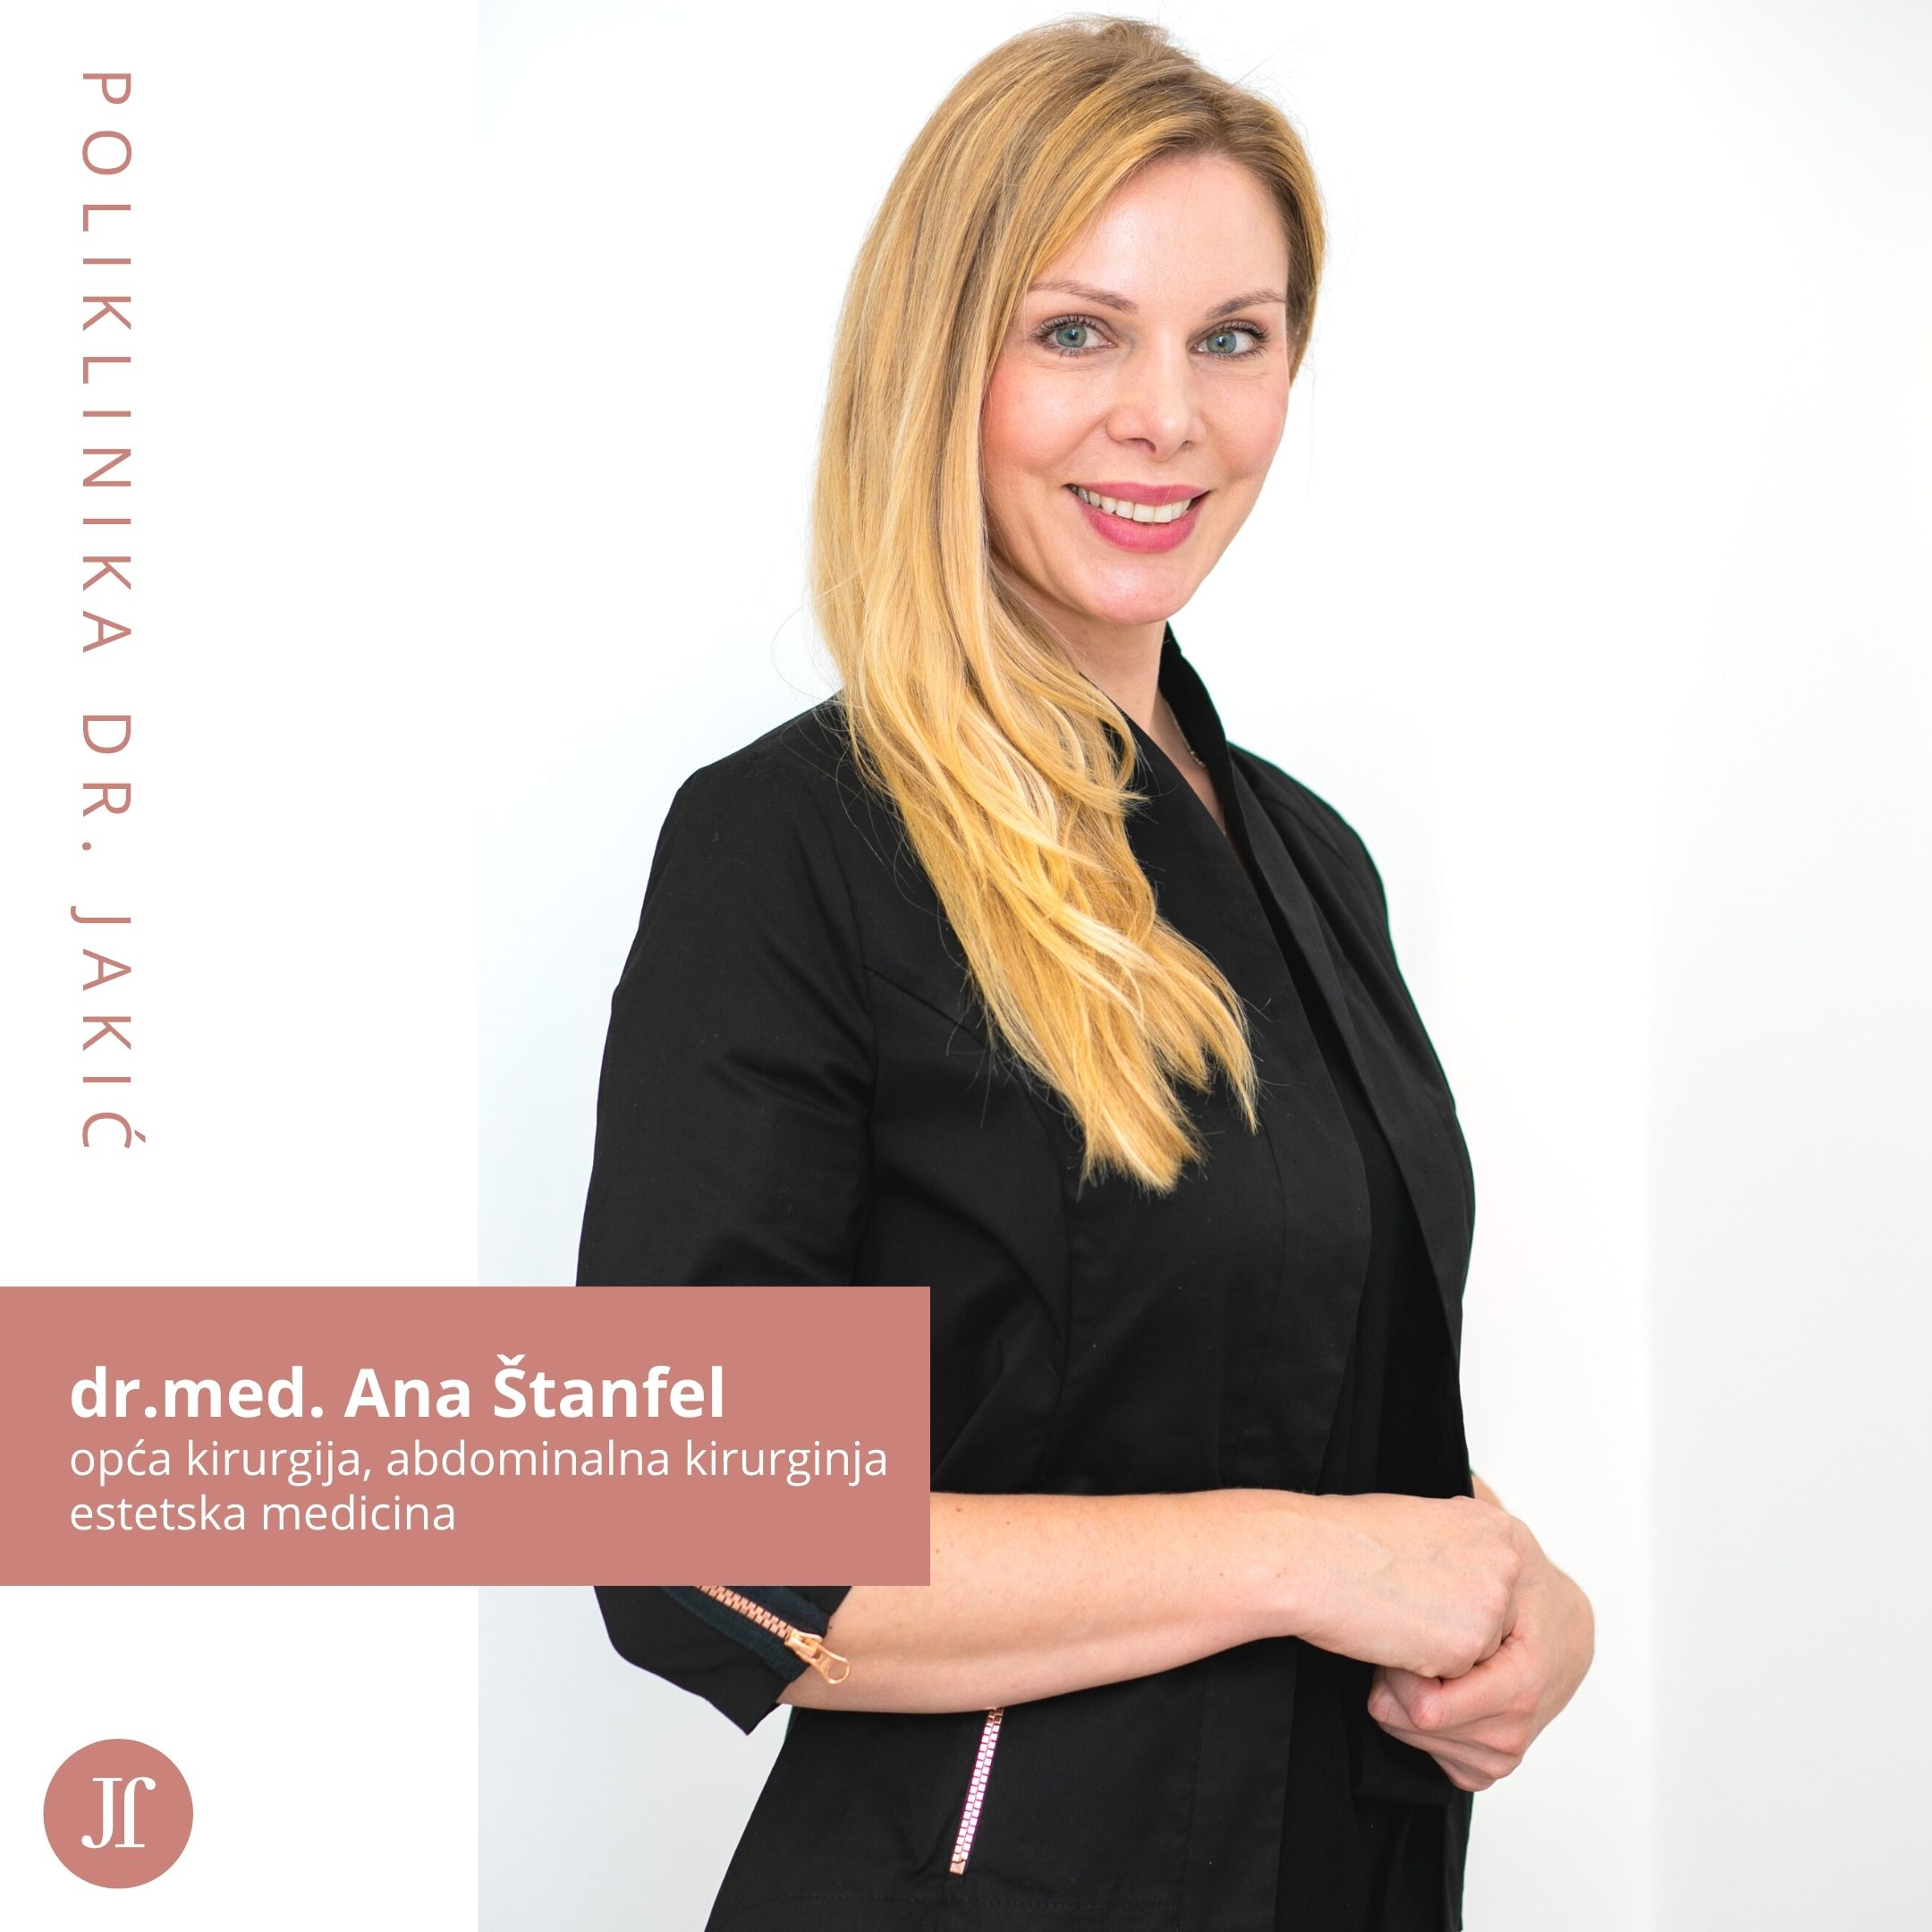 Ana Štanfel, dr.med